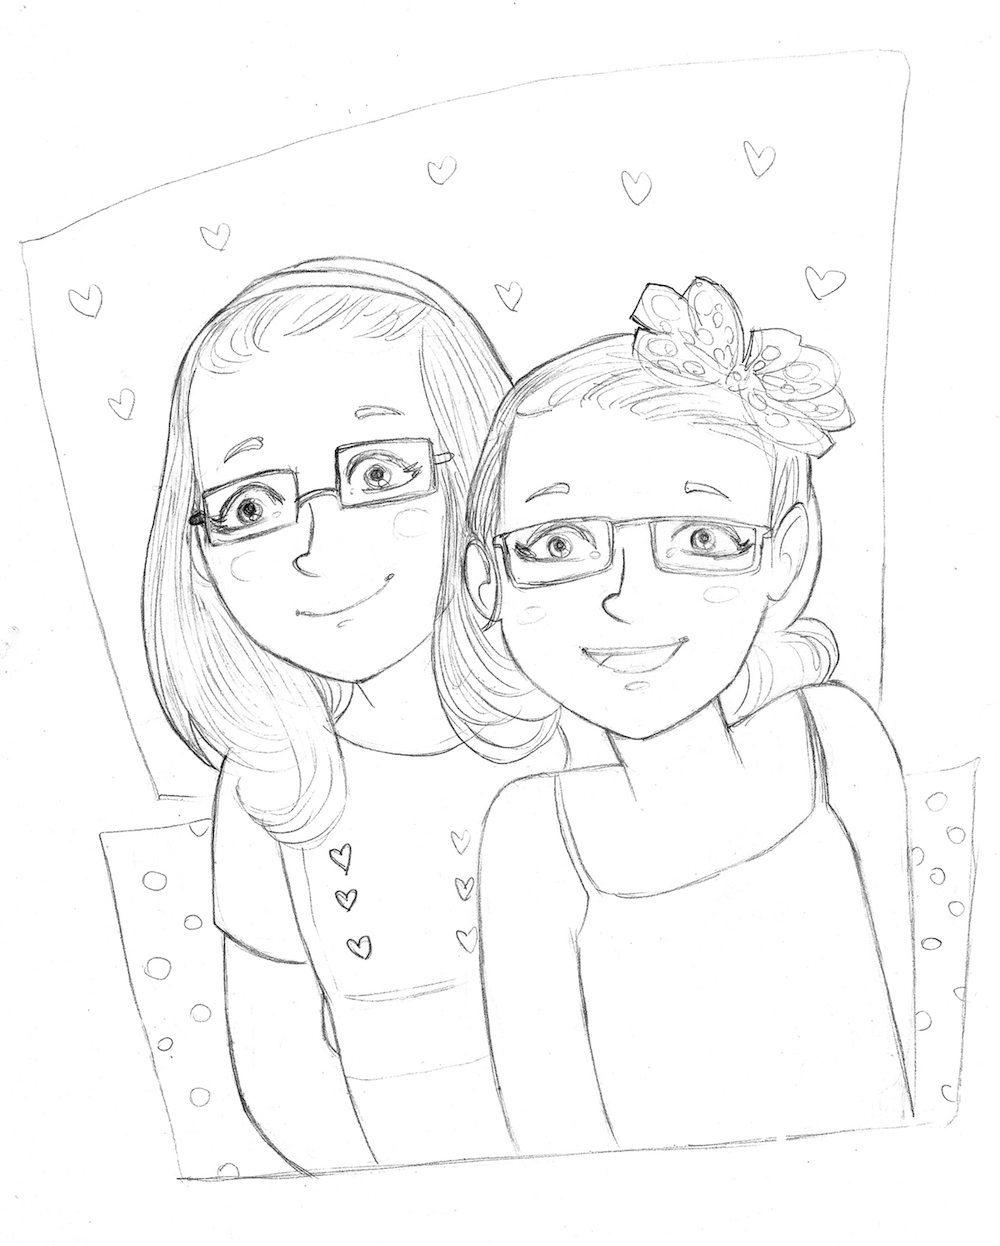 Draft Portrait of Two Sisters by Orgueil via ArtCorgi